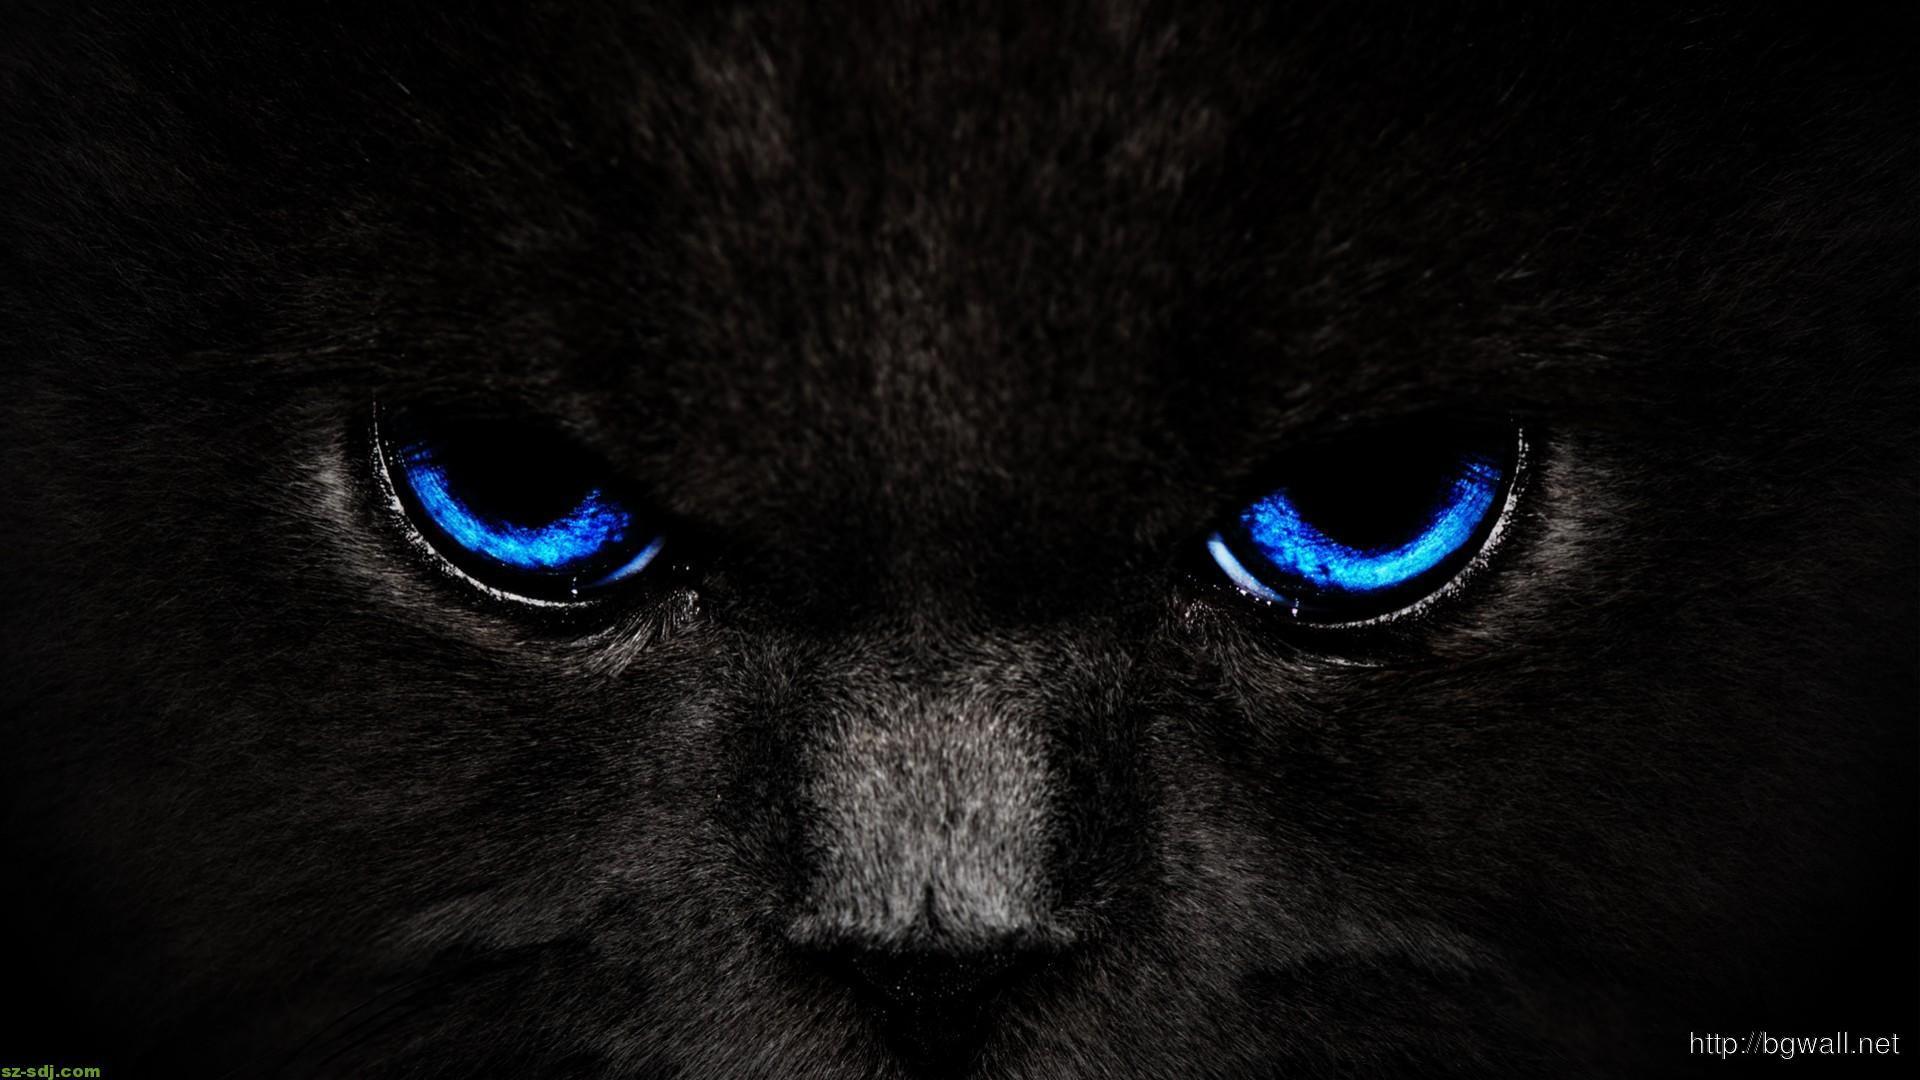 blue-eyes-cat-wallpaper-high-definition